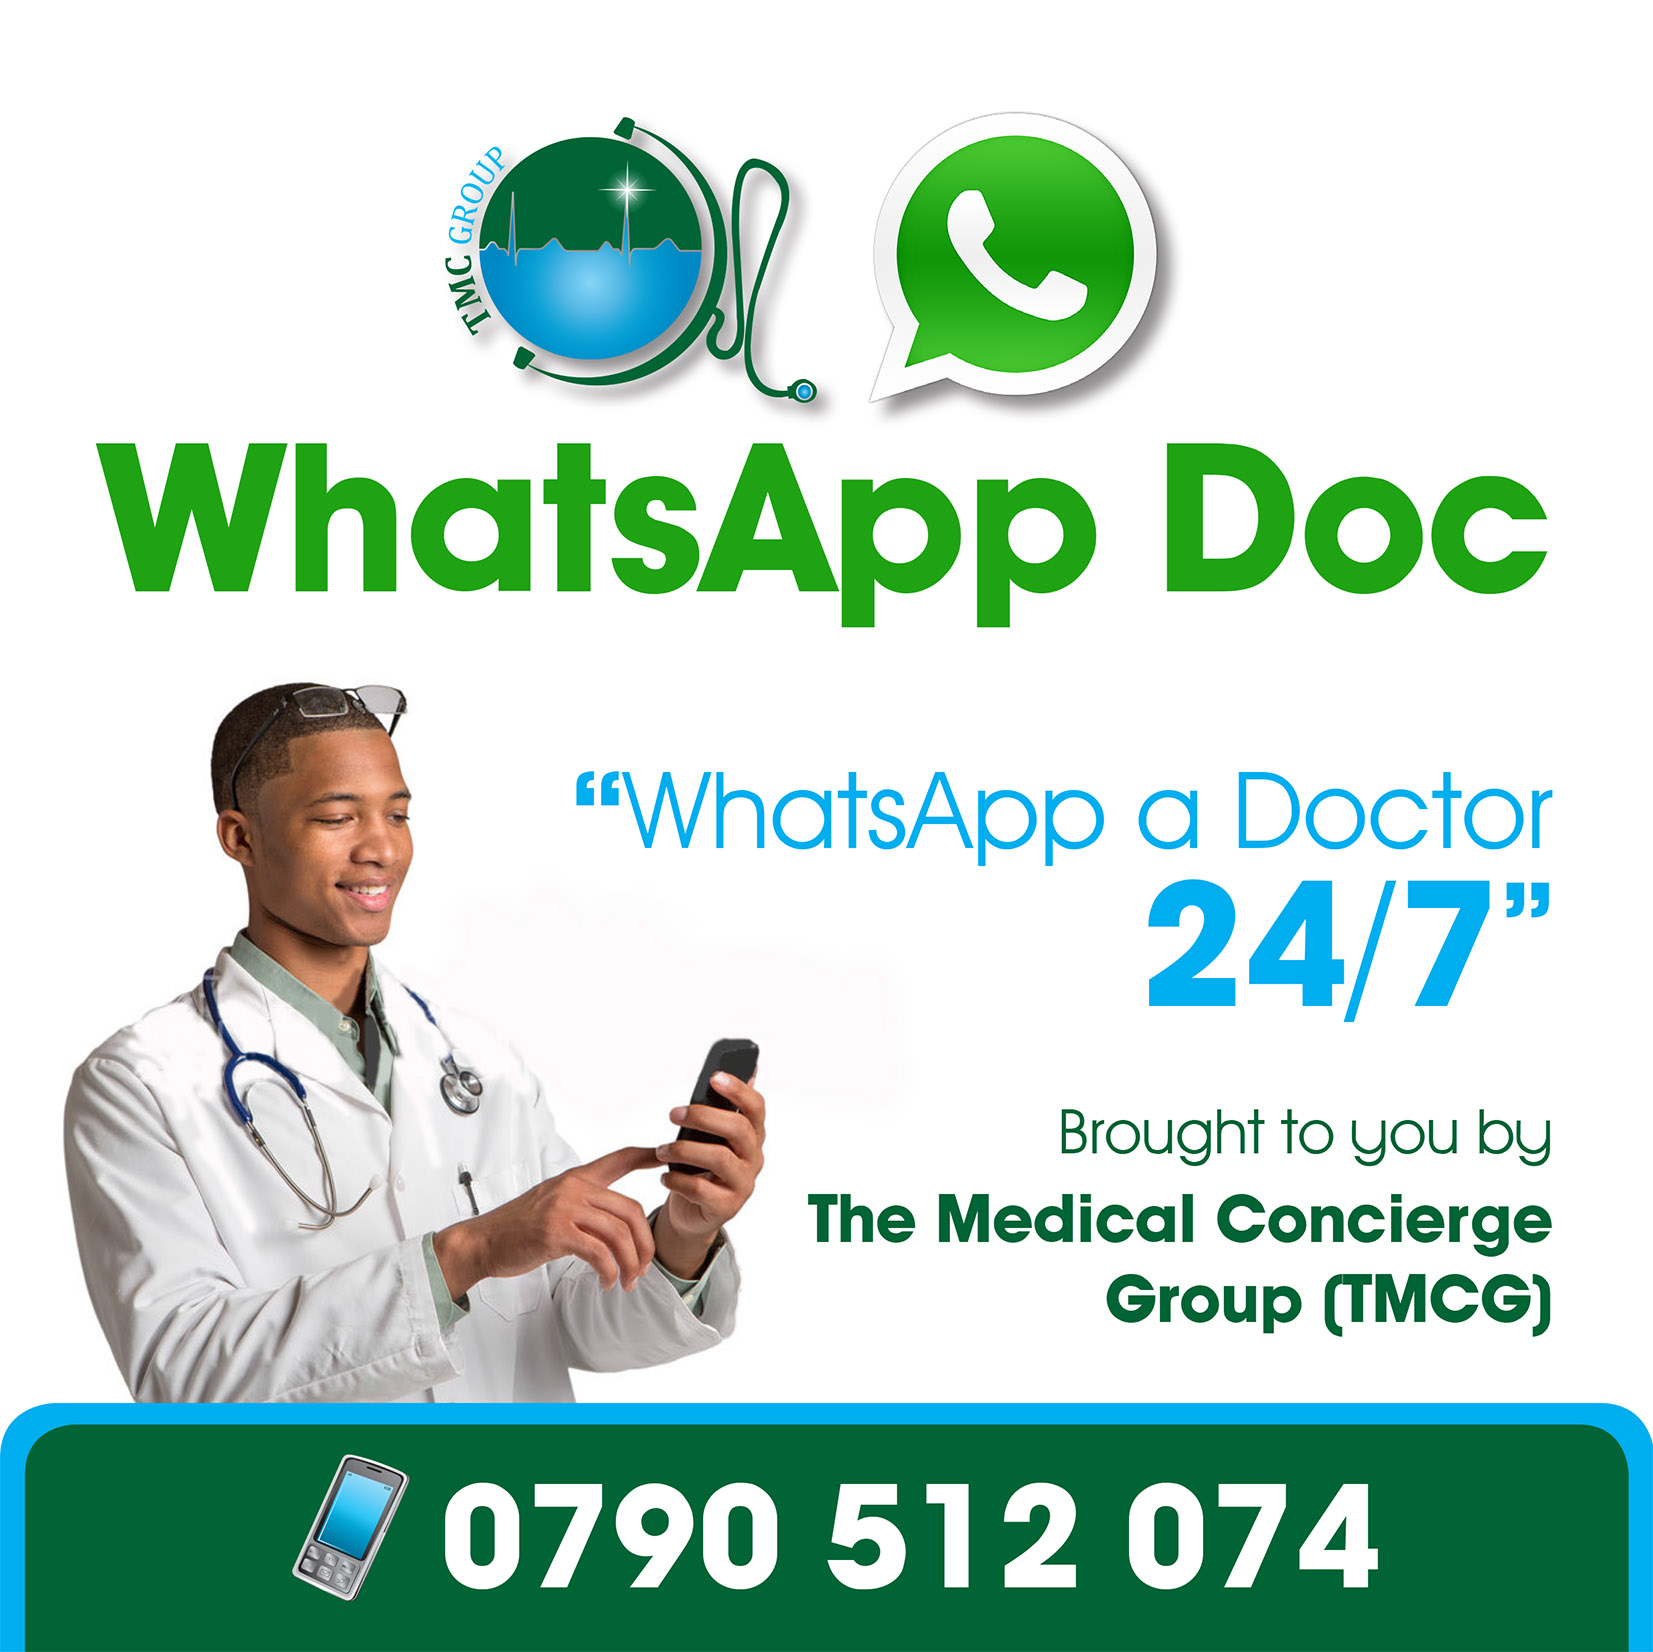 Whatsapp doctor